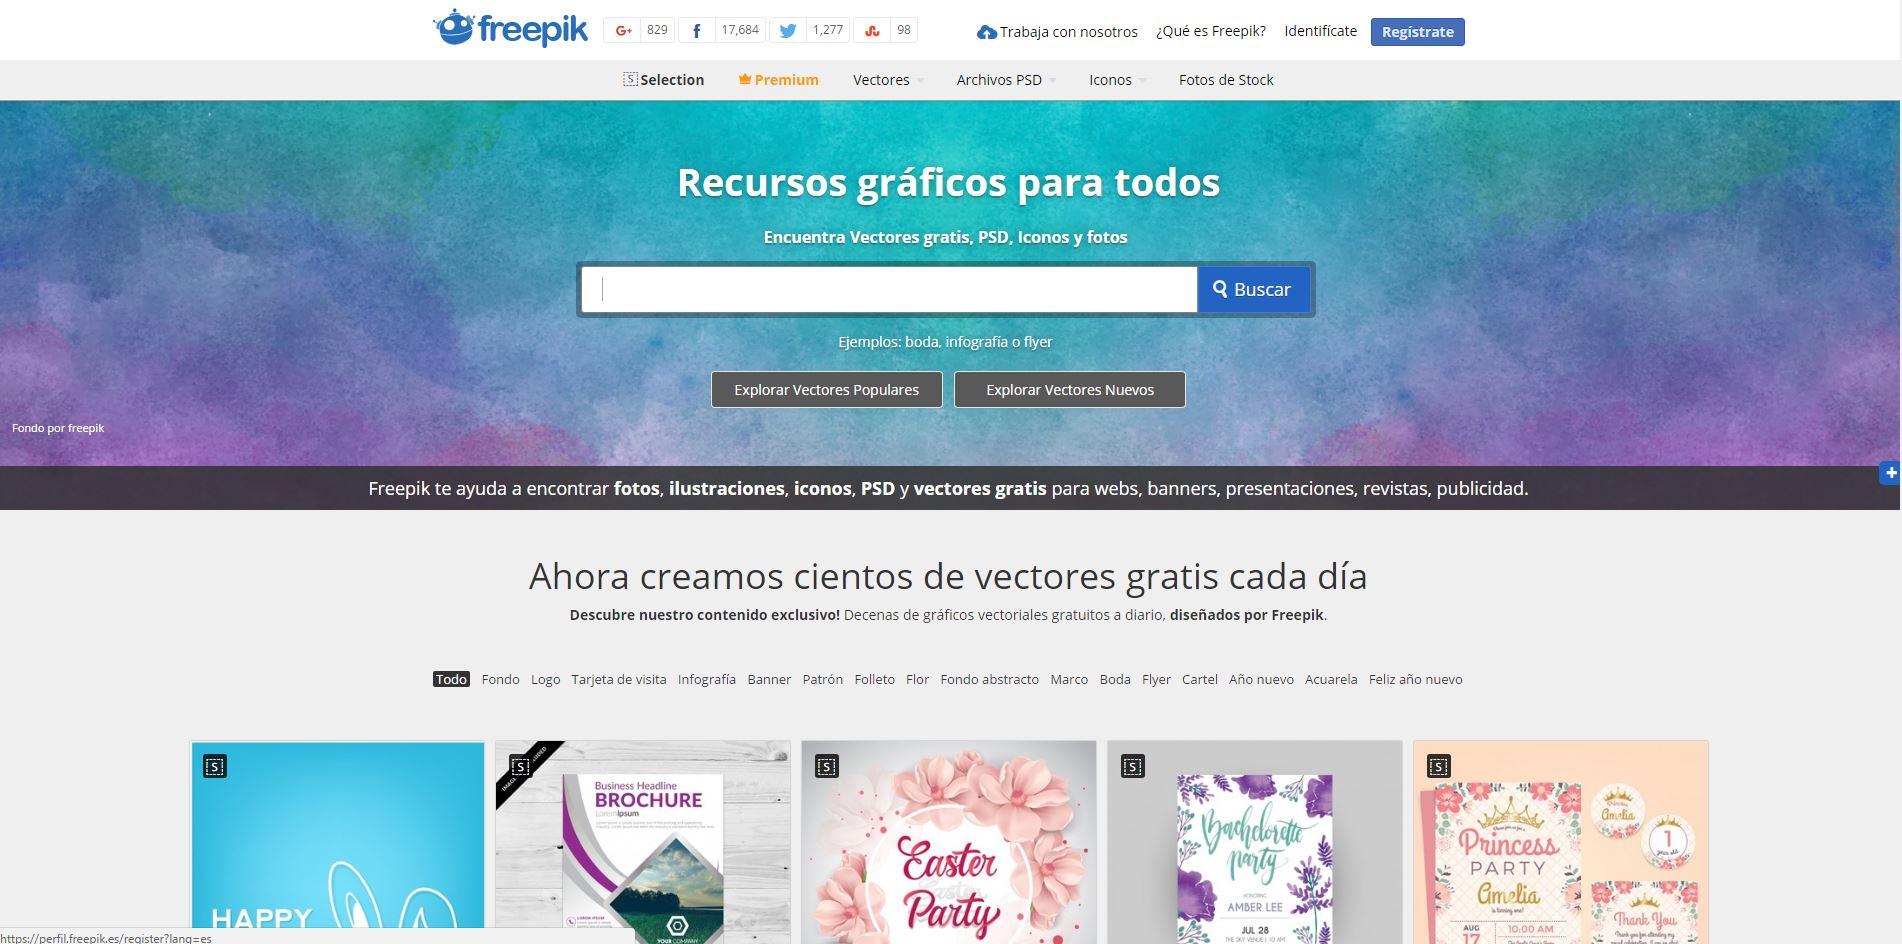 freepik- crear imagenes online